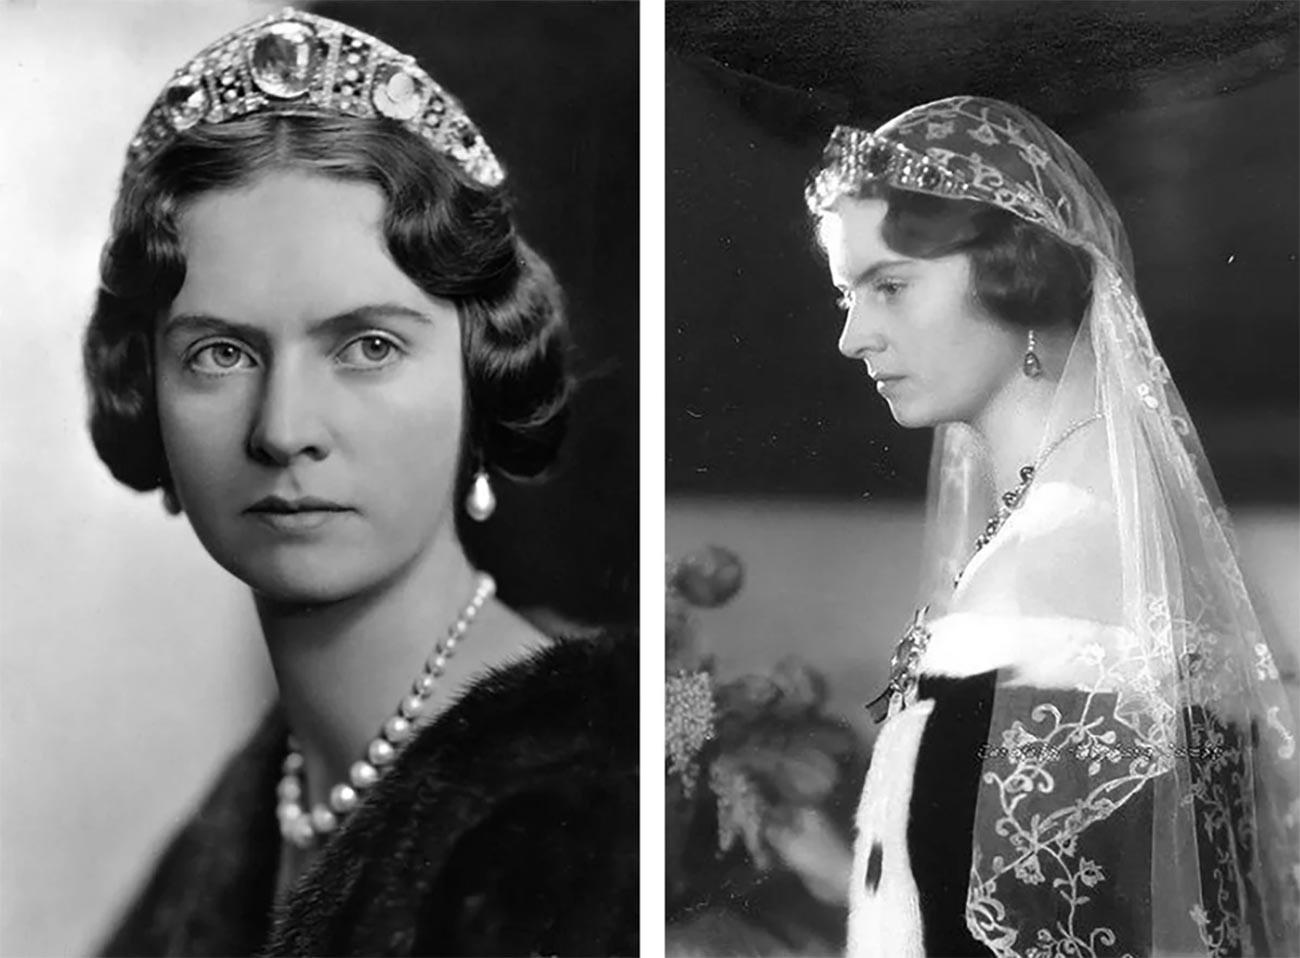 Putri Sibylla dari Saxe-Coburg dan Gotha